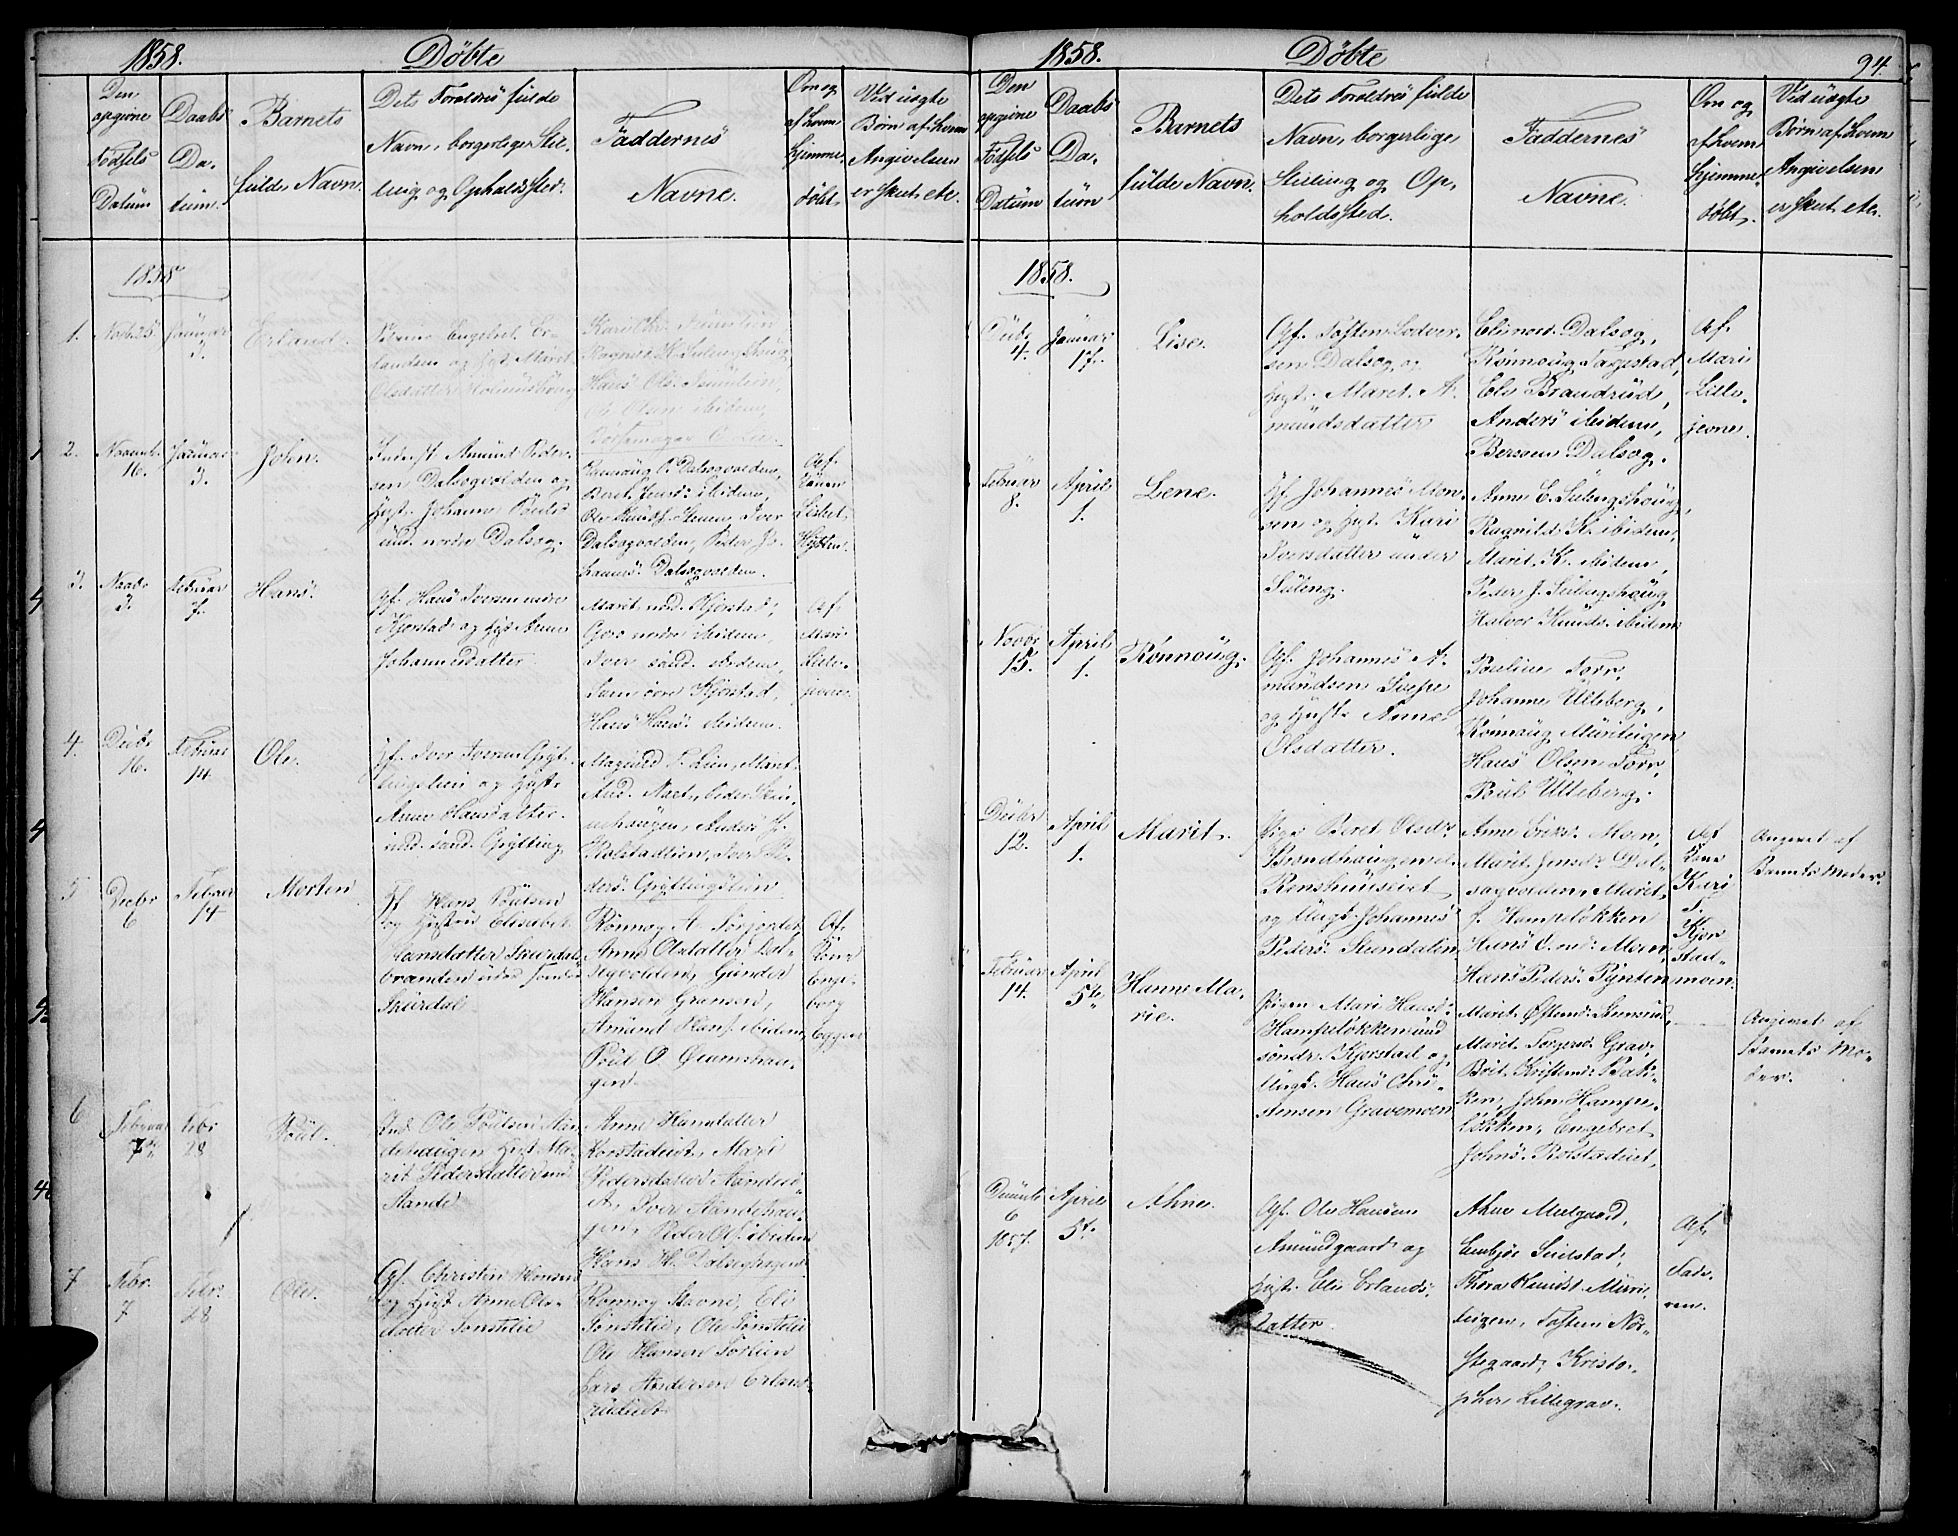 SAH, Sør-Fron prestekontor, H/Ha/Hab/L0001: Klokkerbok nr. 1, 1844-1863, s. 94